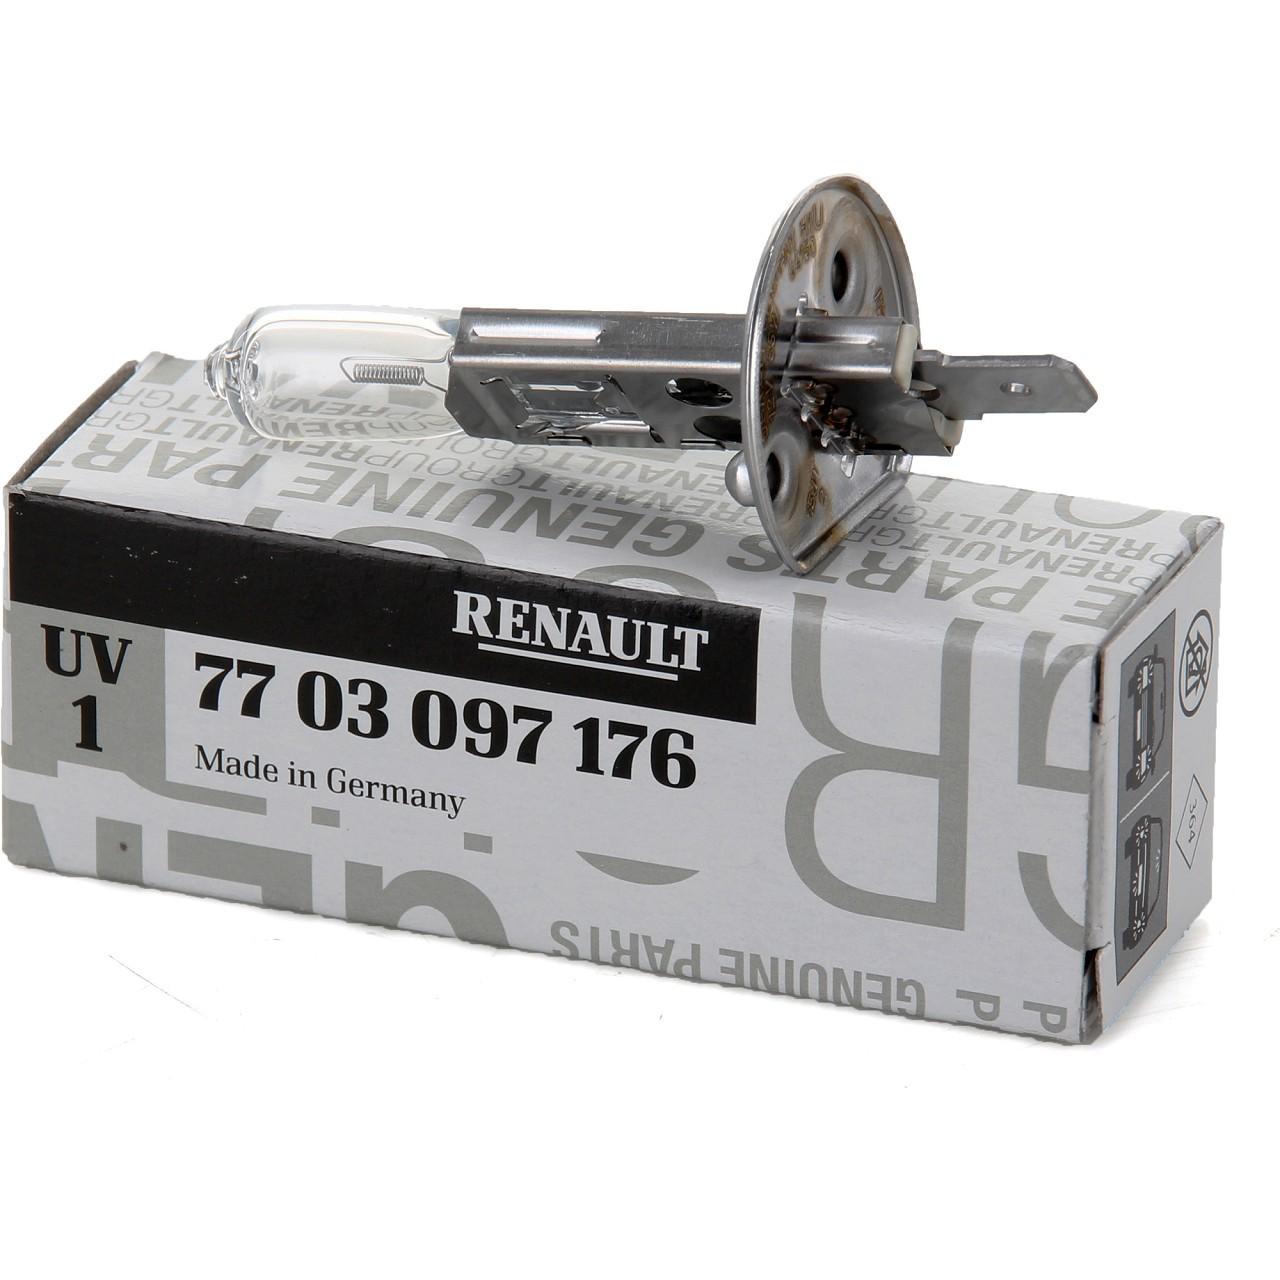 ORIGINAL Renault Halogenlampe H1 12V 55W P14.5s (1 Stück) 7703097176